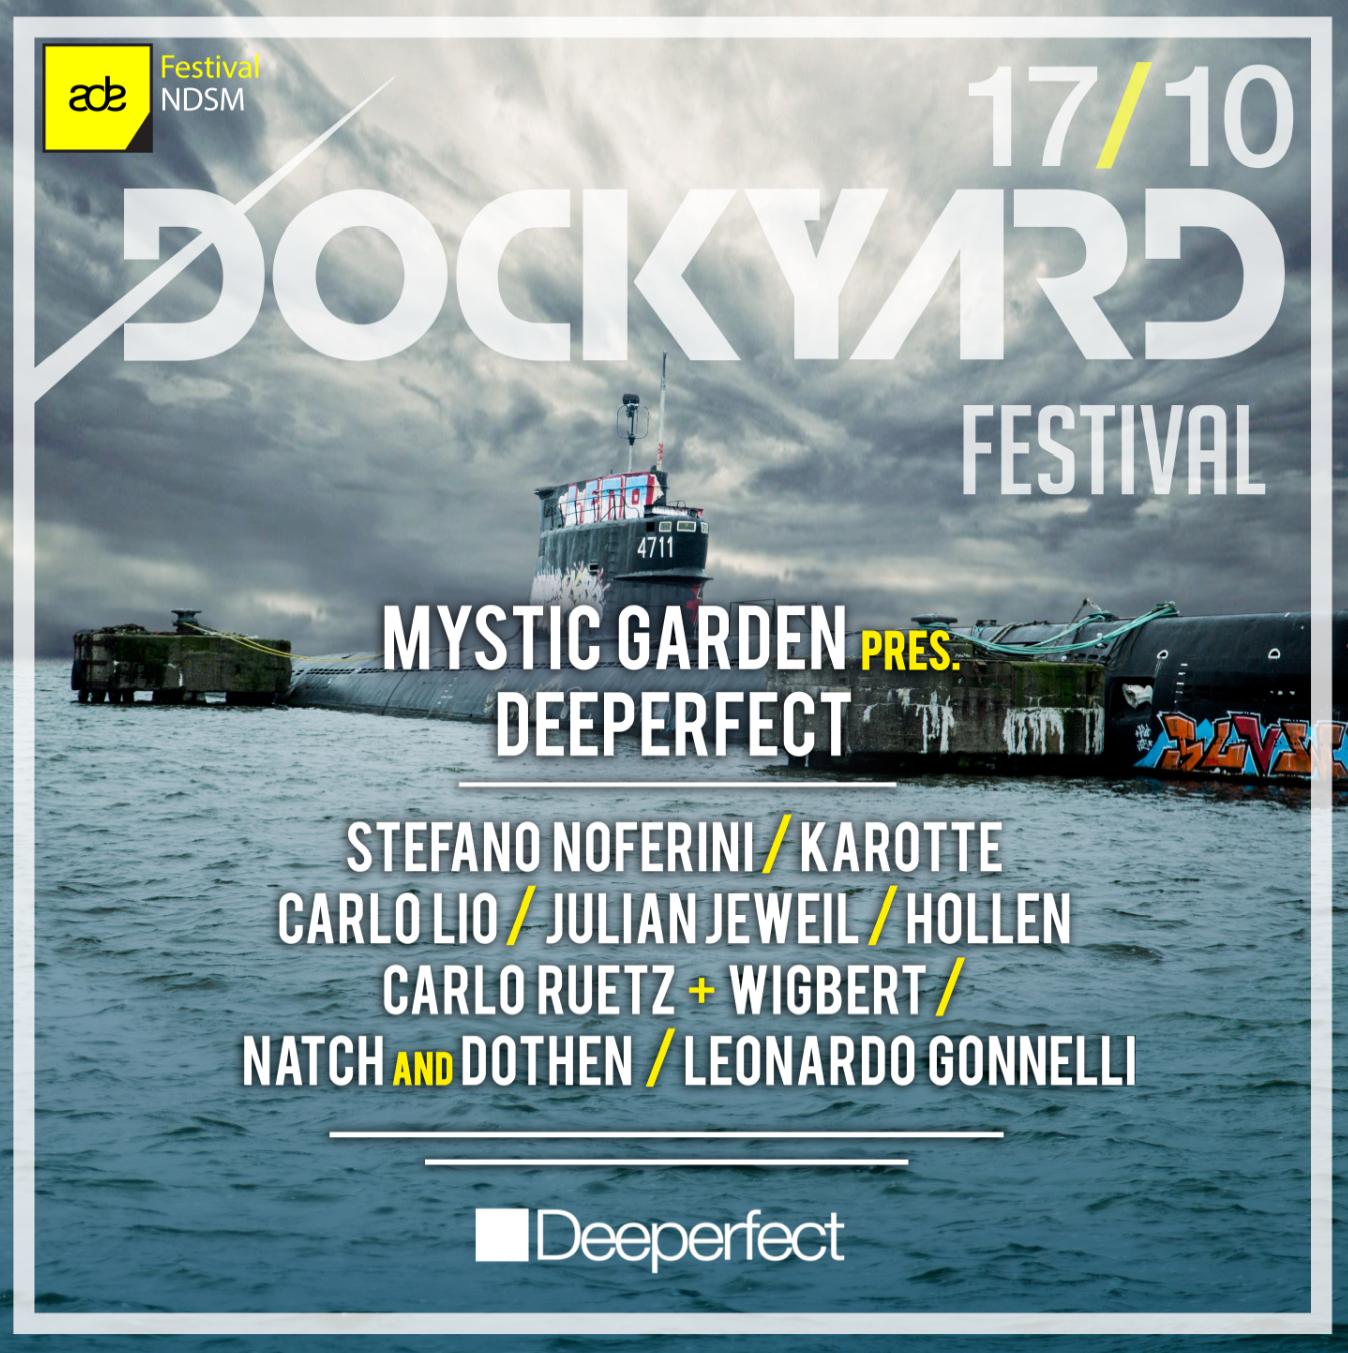 Deeperfect Stage at Dockyard 2015 CORRETTA